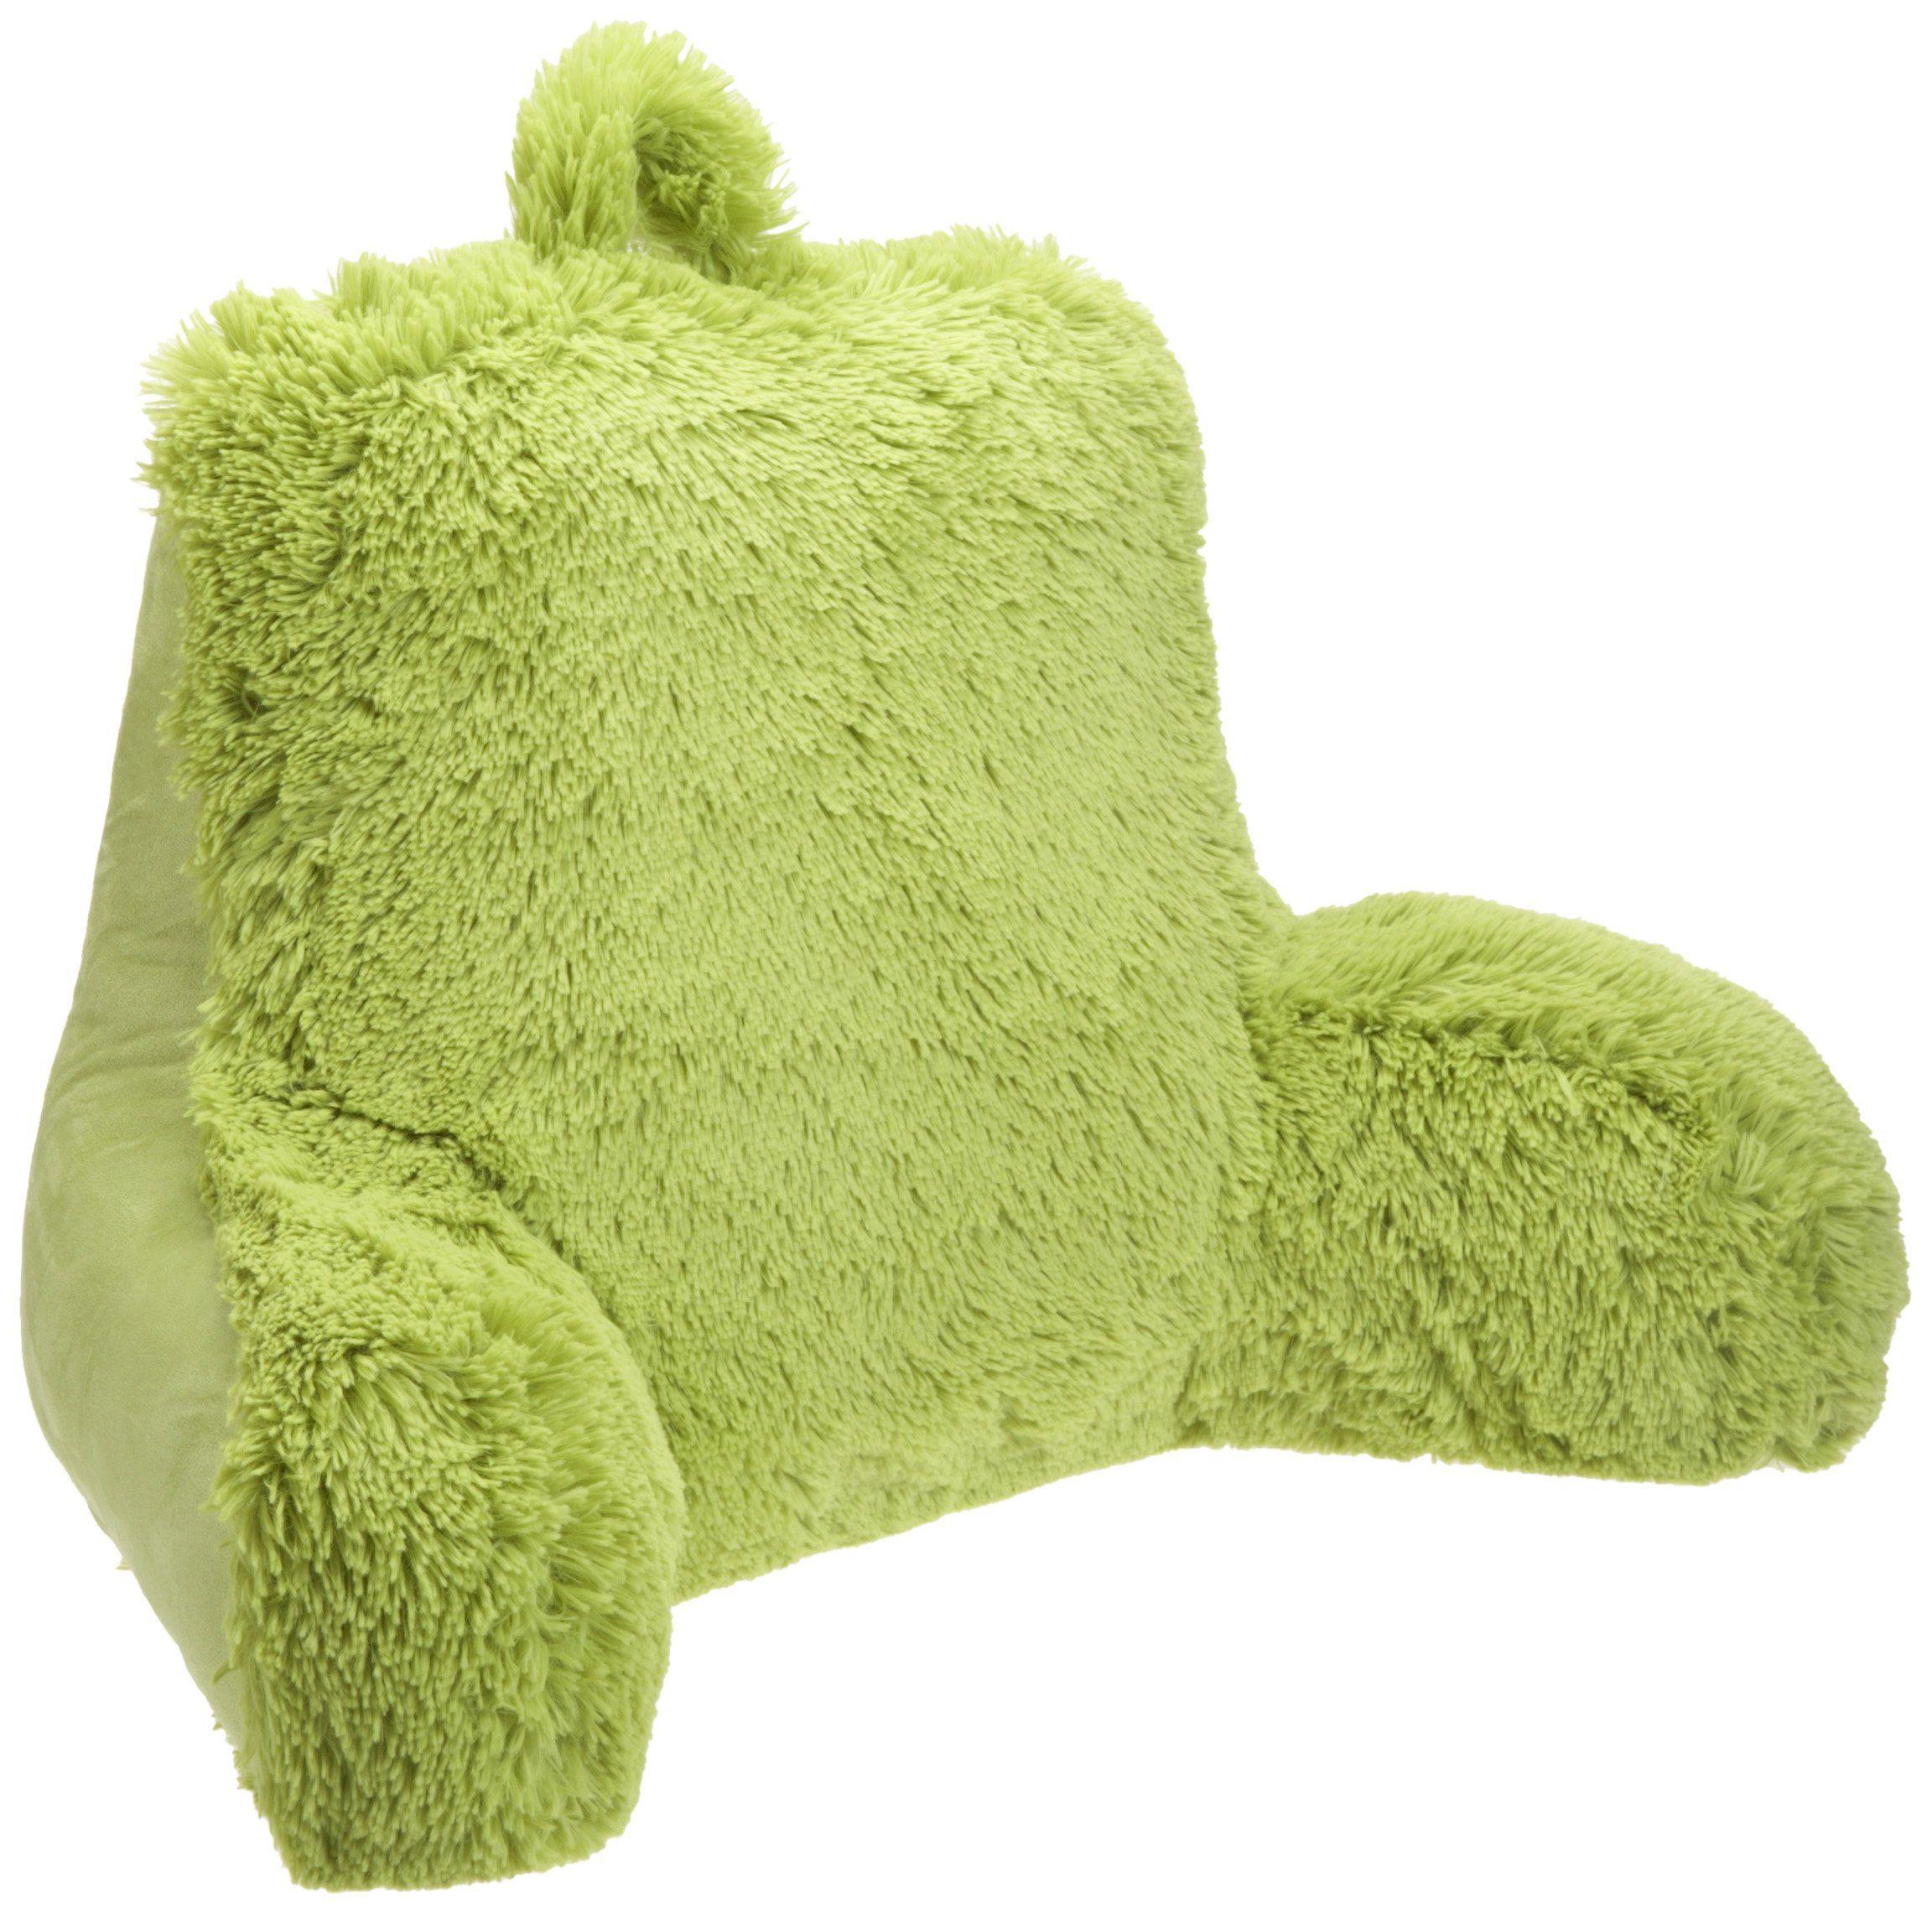 bed rest pillow